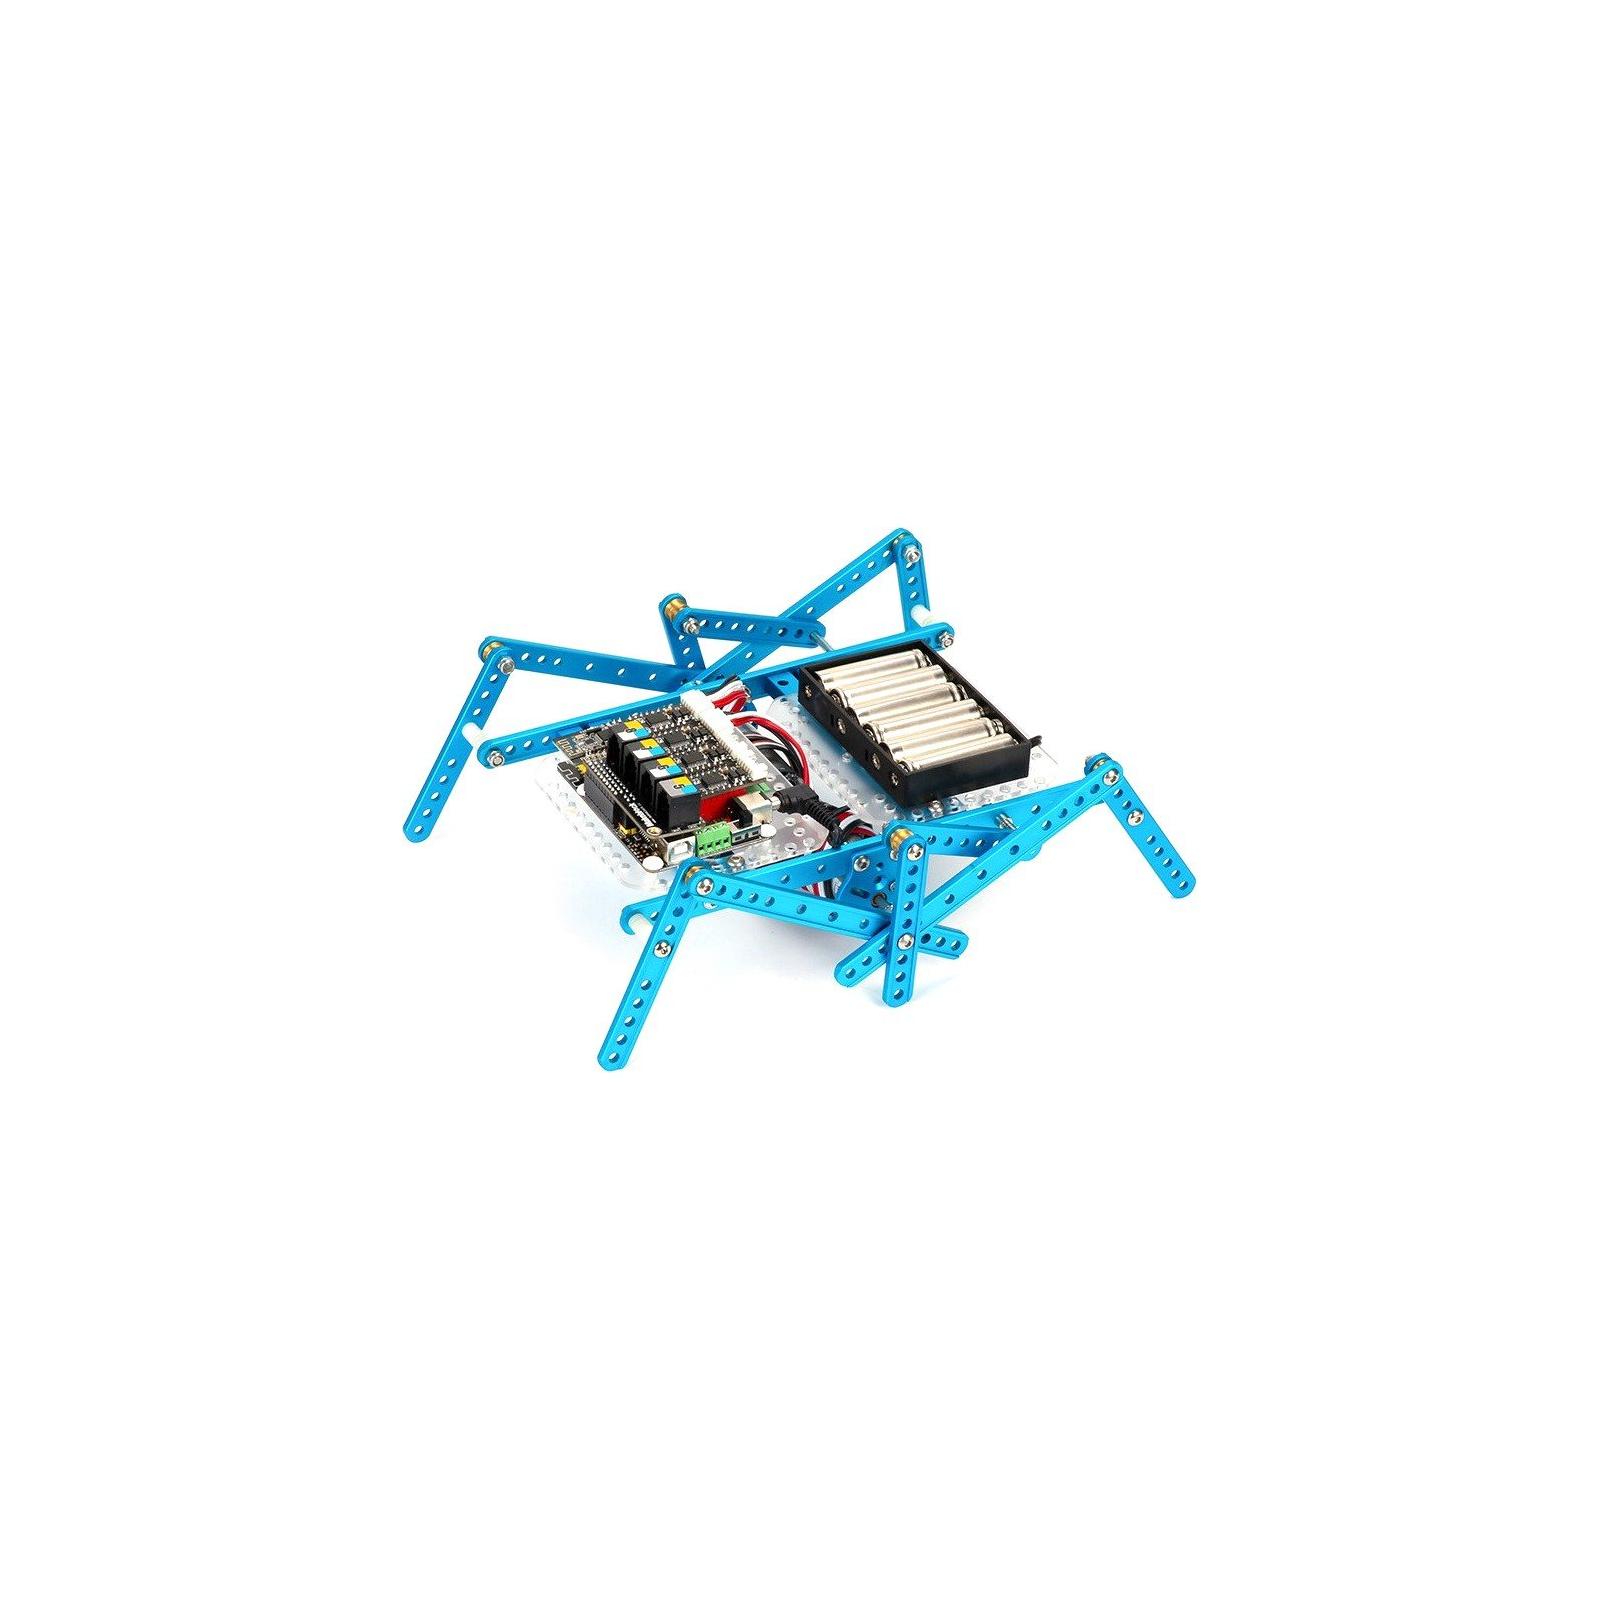 Робот Makeblock Ultimate v2.0 Robot Kit (09.00.40) изображение 2